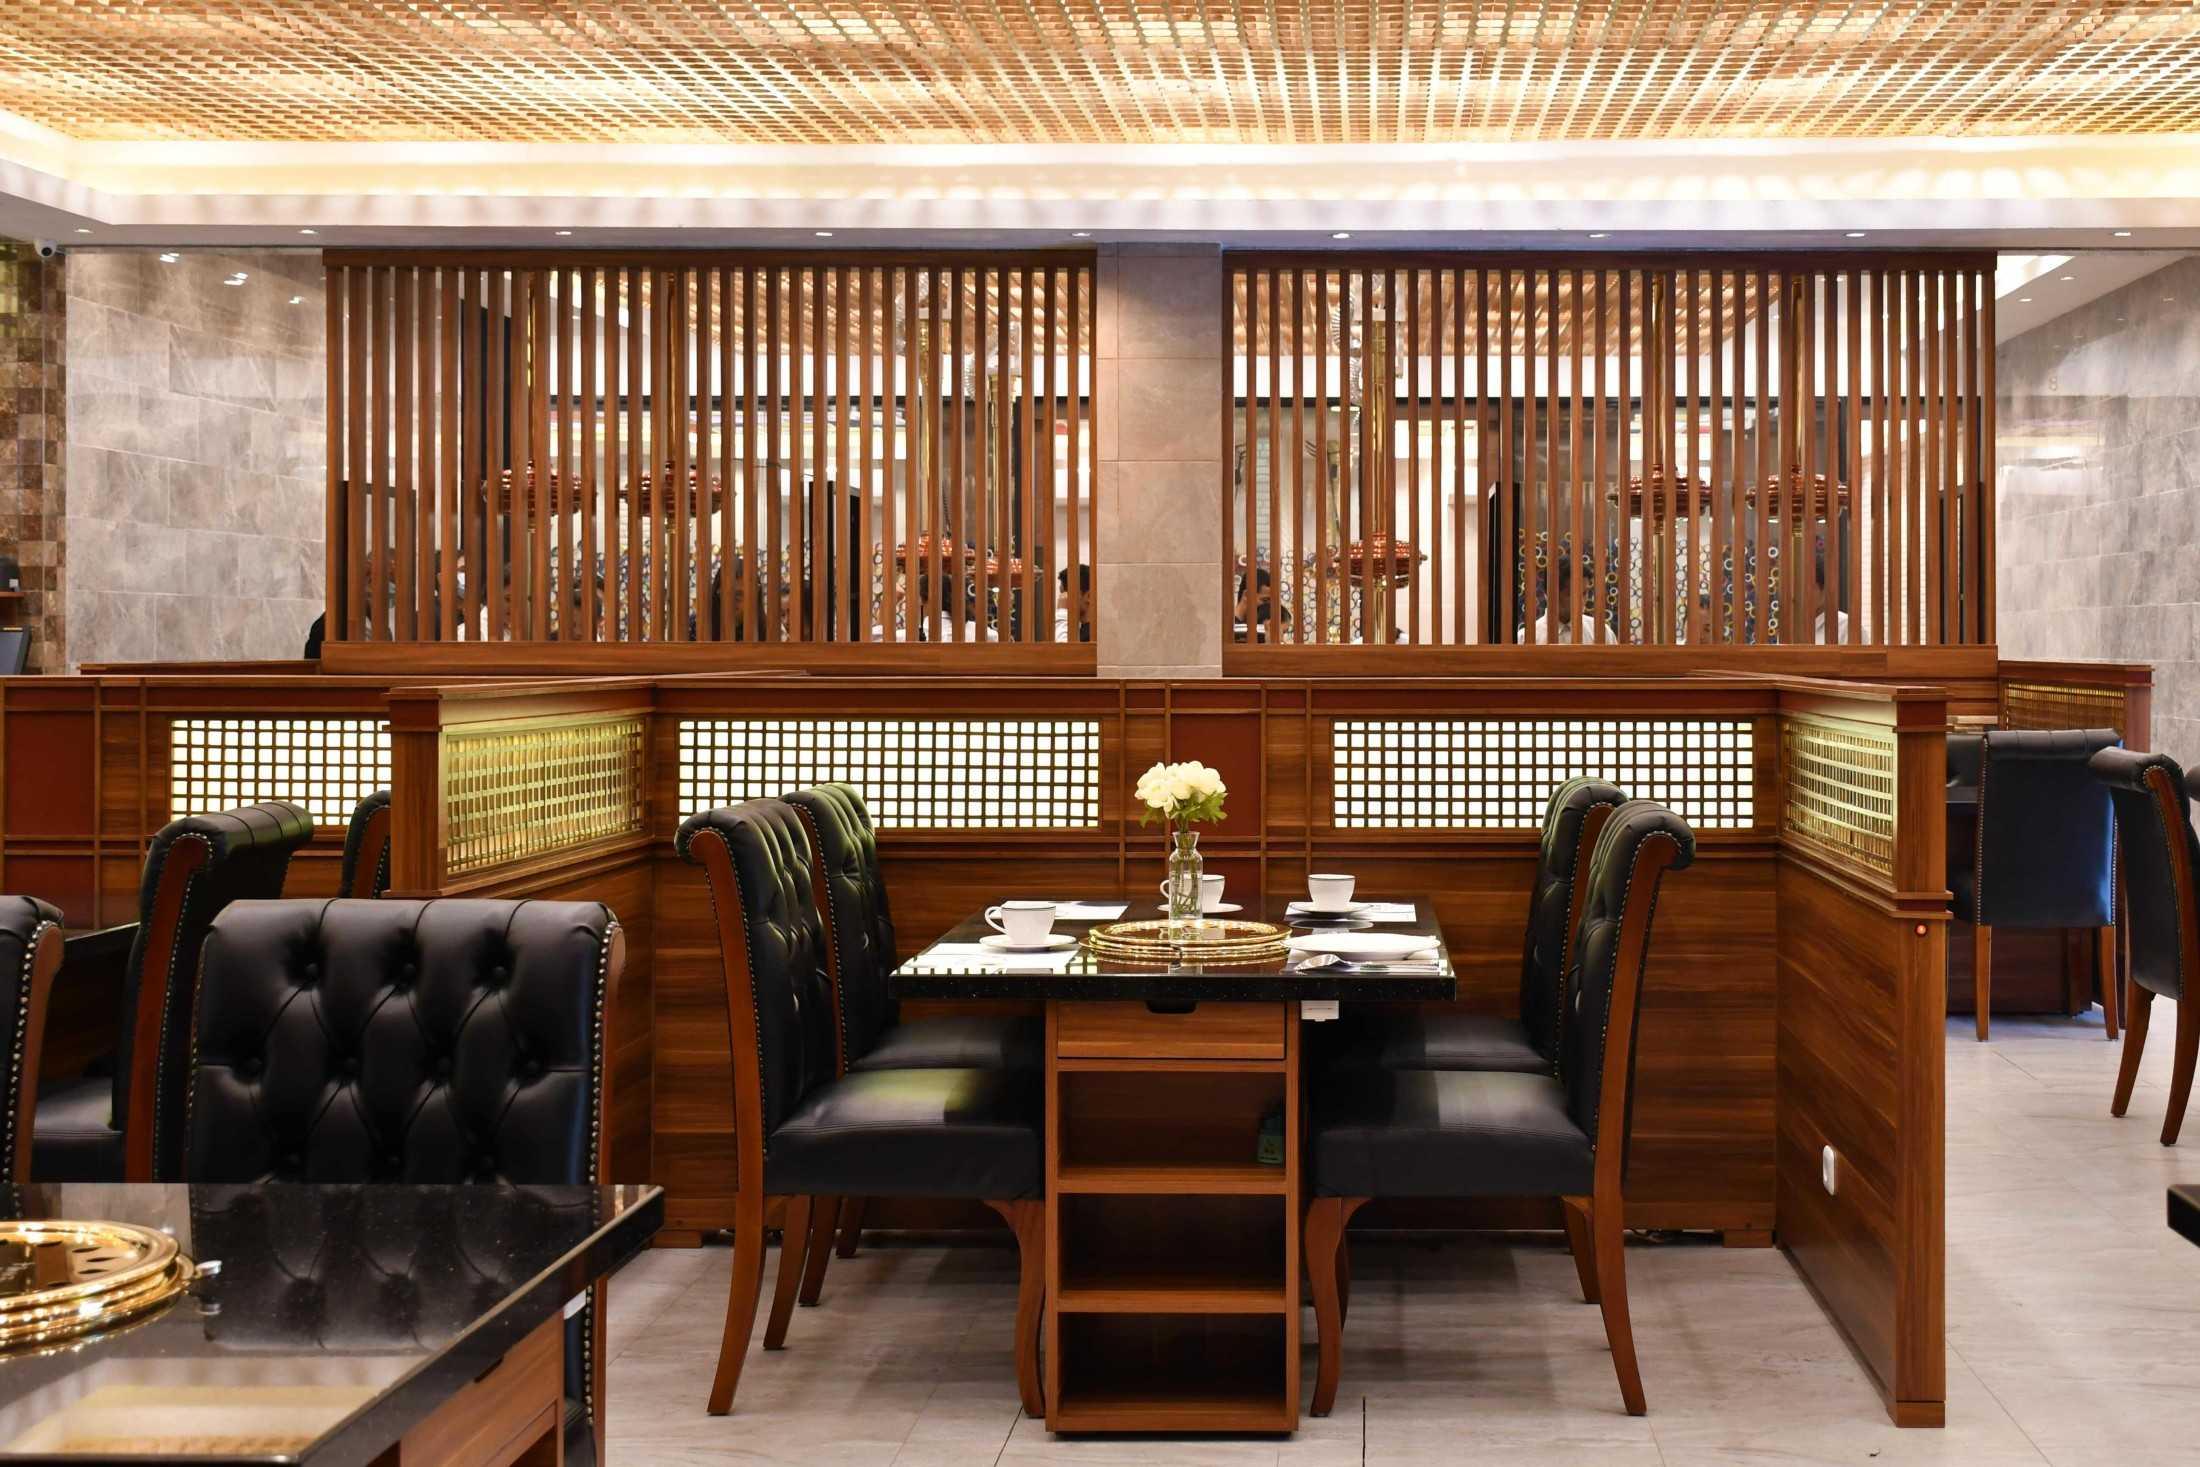 Livien Interior Songa Resto Surabaya, Kota Sby, Jawa Timur, Indonesia Surabaya, Kota Sby, Jawa Timur, Indonesia Livien-Interior-Songa-Resto  82361